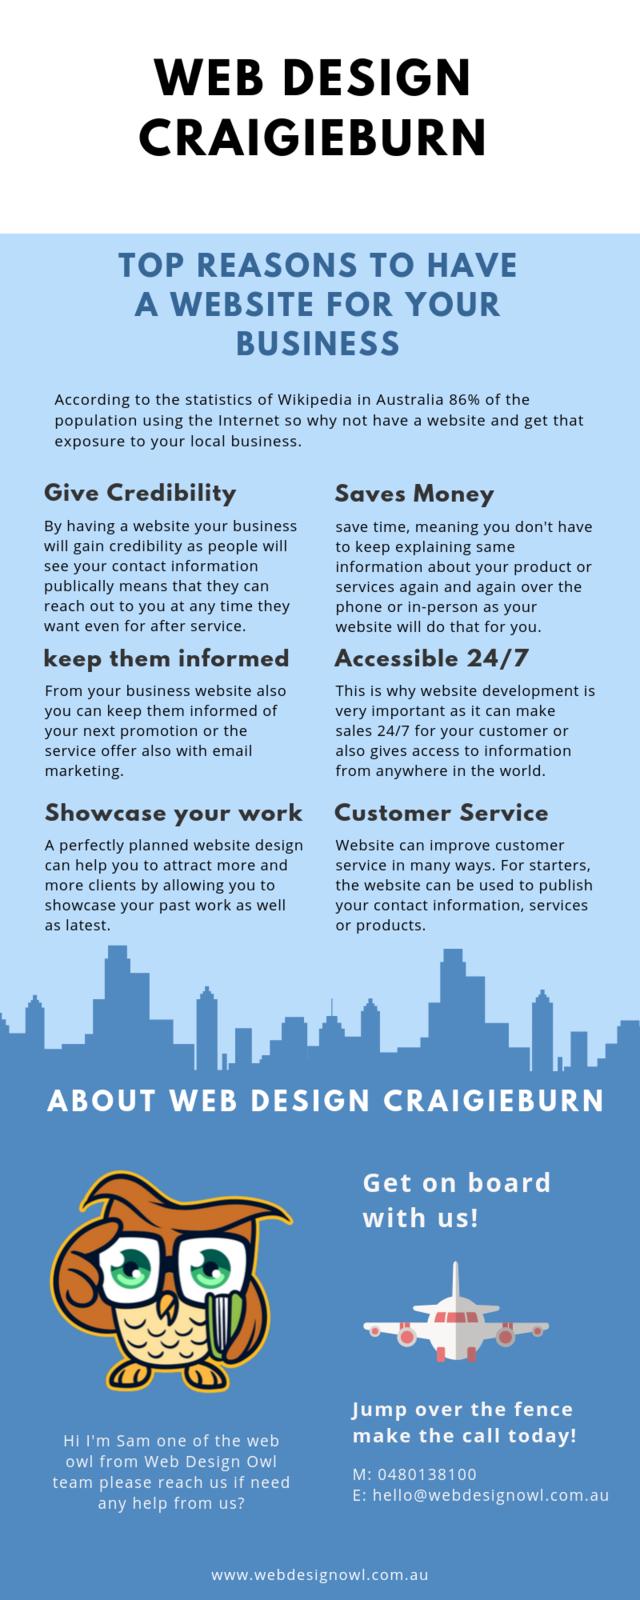 Web design craigieburn